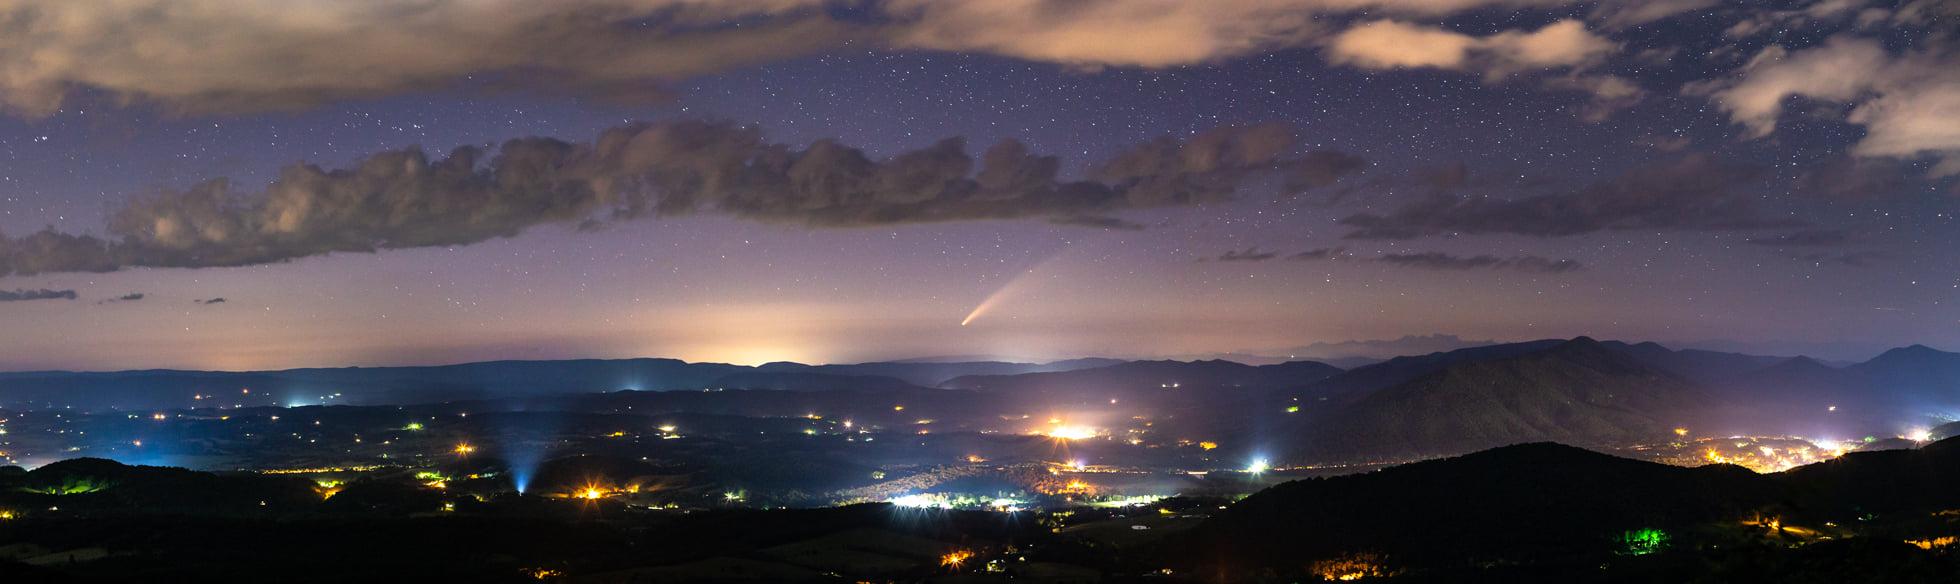 comet neowise Botetourt County Virginia Jason Rinehart